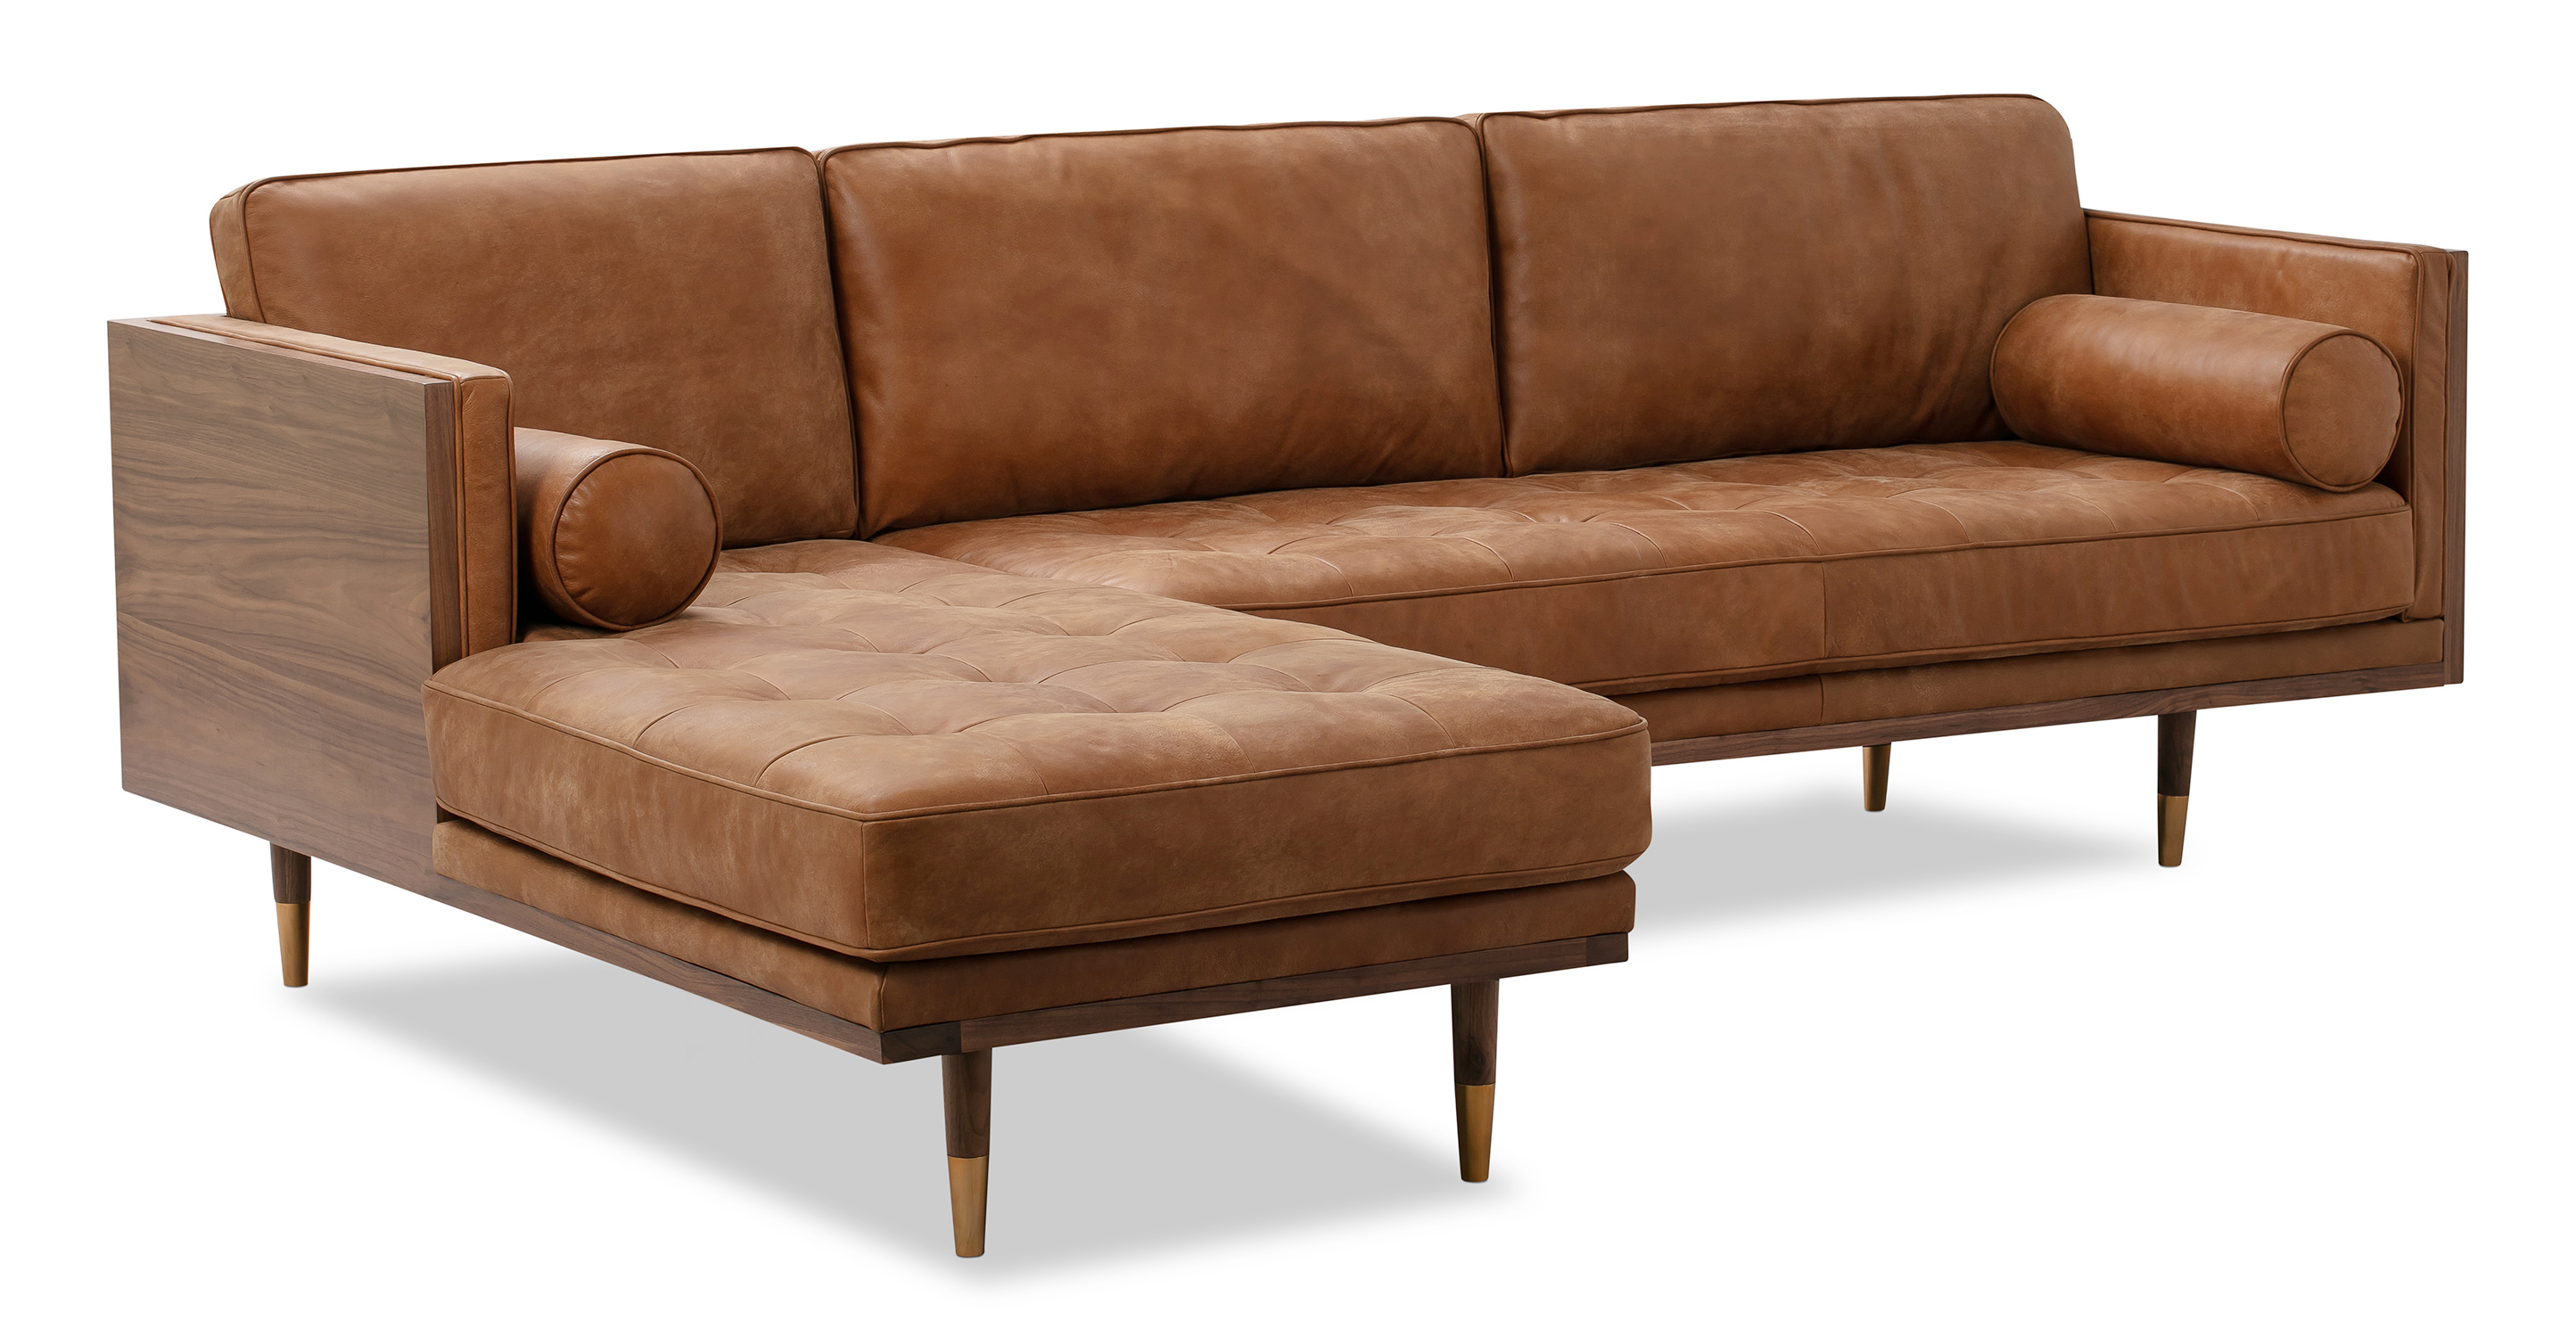 "Woodrow Skandi 95"" Leather Sectional Left, Walnut/Cognac"